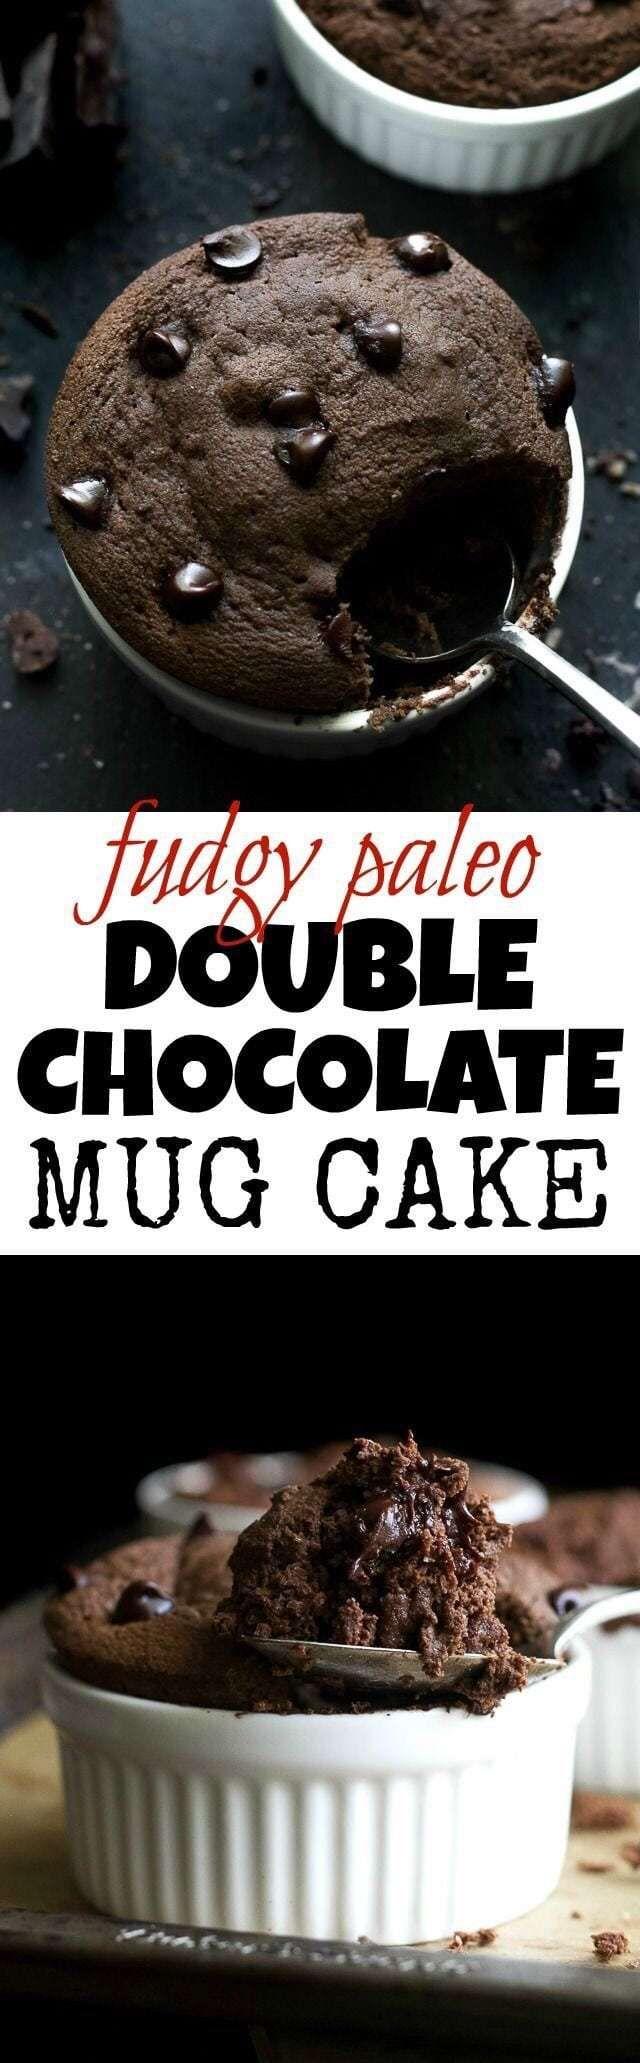 25 Gluten-Free Mug Cake Recipes: Moist & Delicious | Mug ...